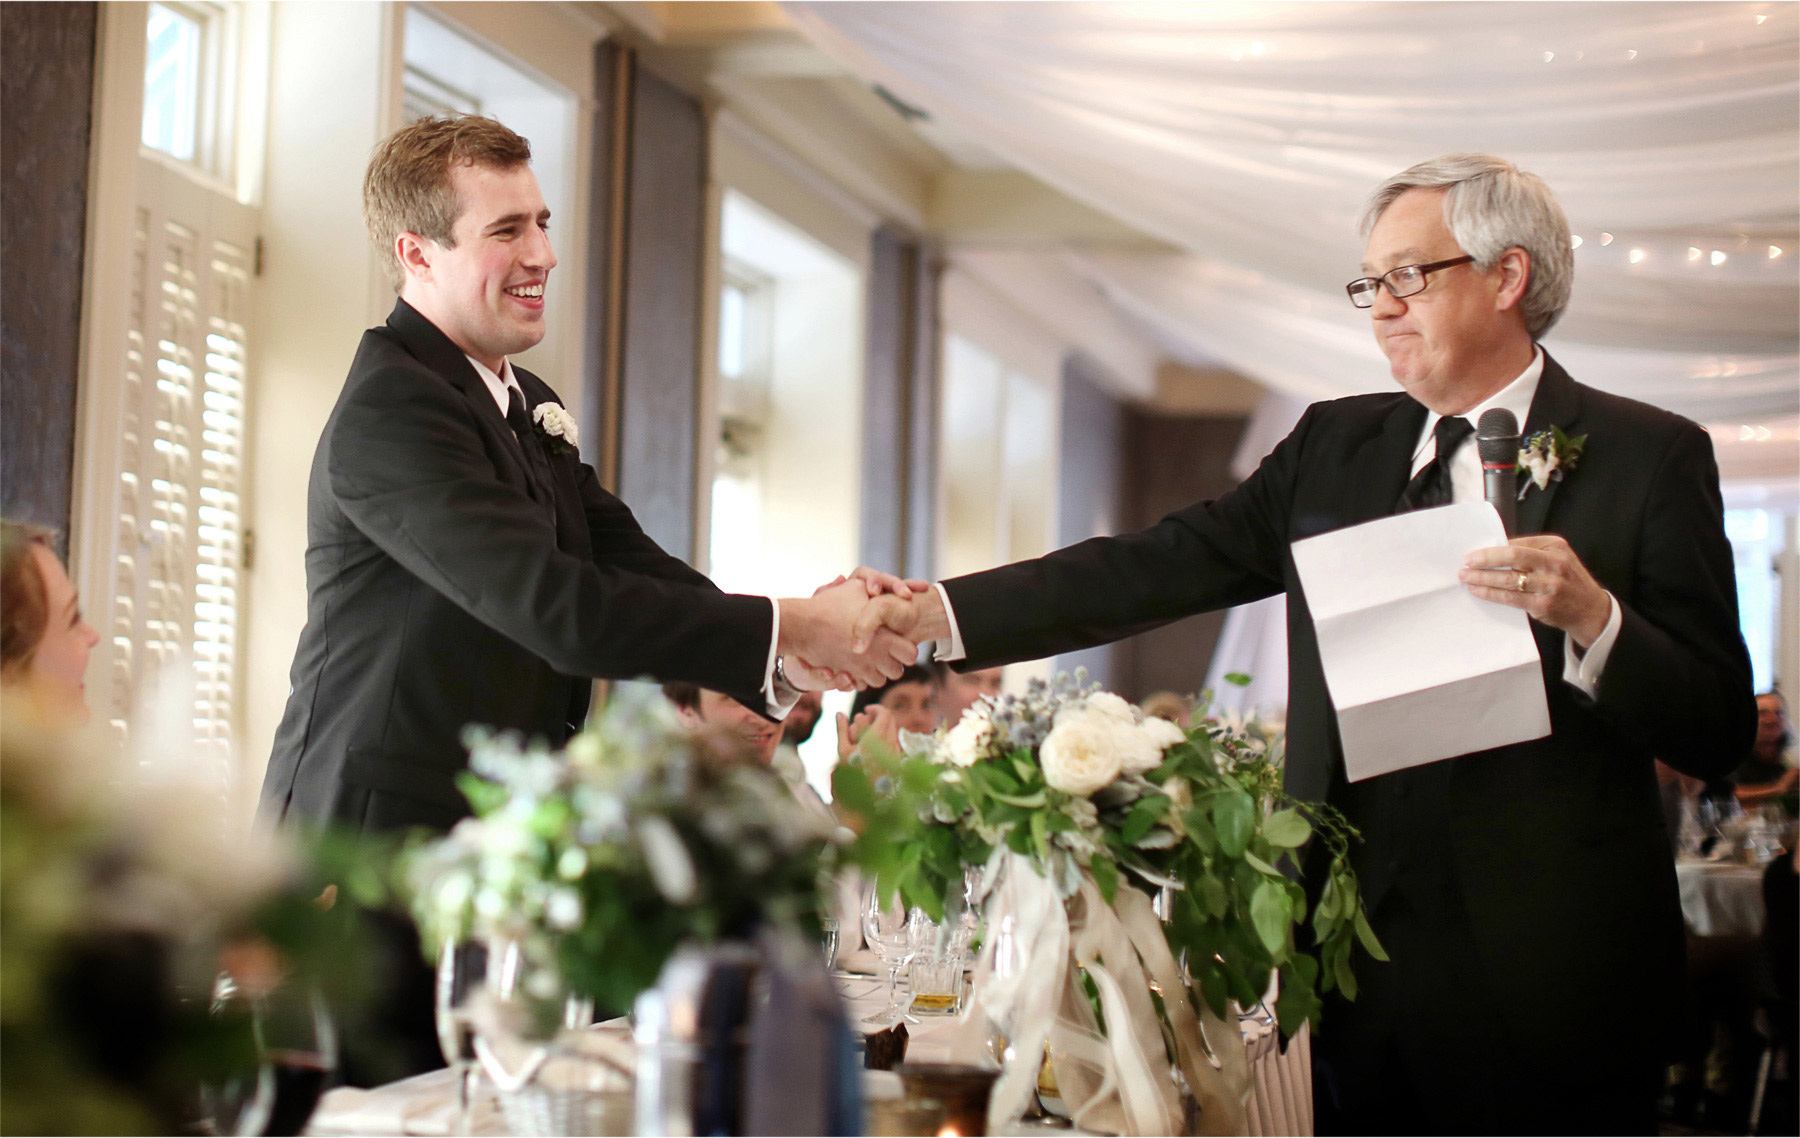 26-Edina-Minnesota-Wedding-Photographer-by-Andrew-Vick-Photography-Summer-Country-Club-Groom-Reception-Speeches-Toasts-Handshake-Betsy-and-Jon.jpg